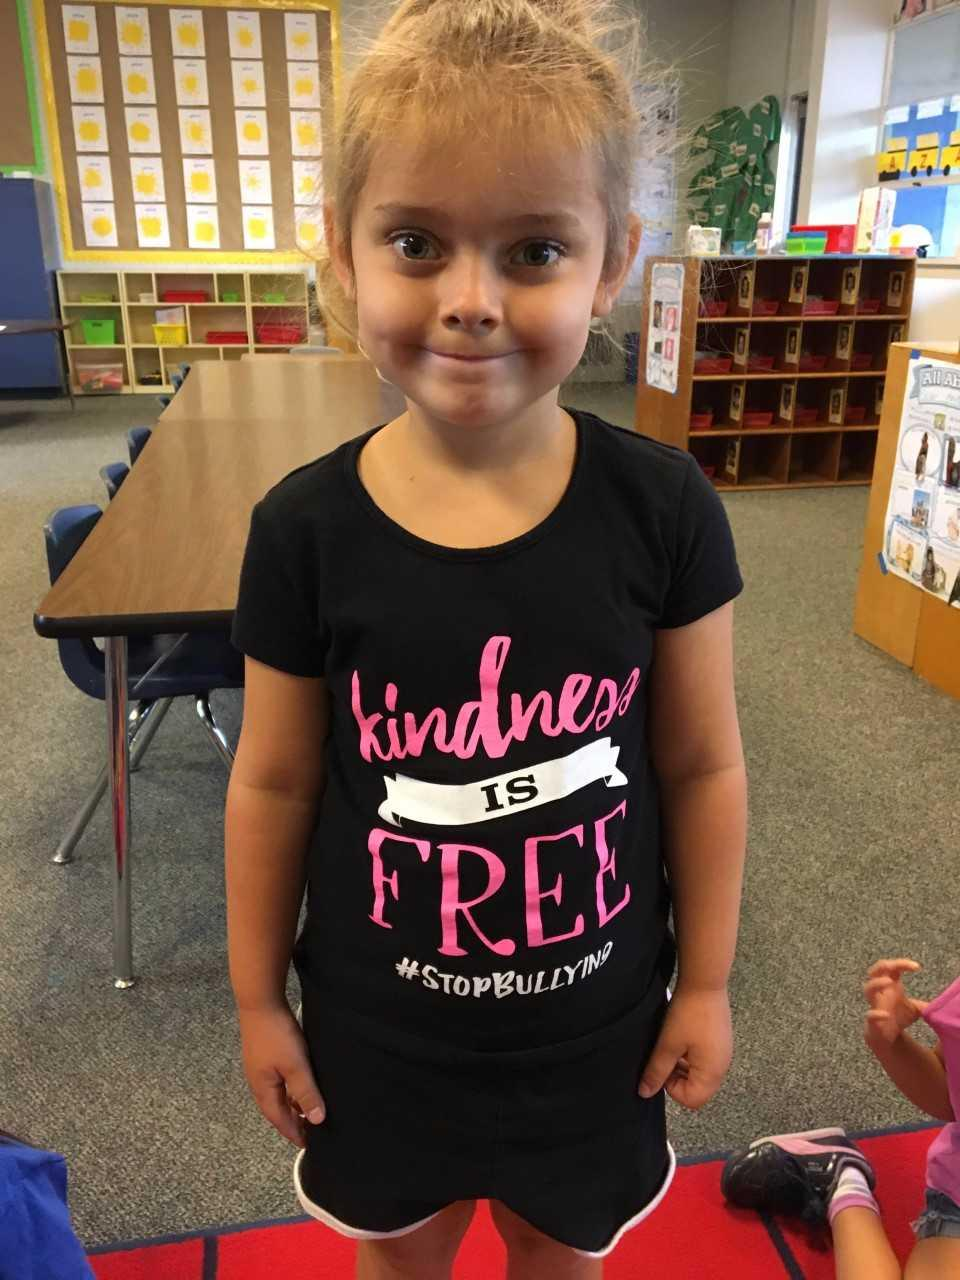 student wearing kindness shirt